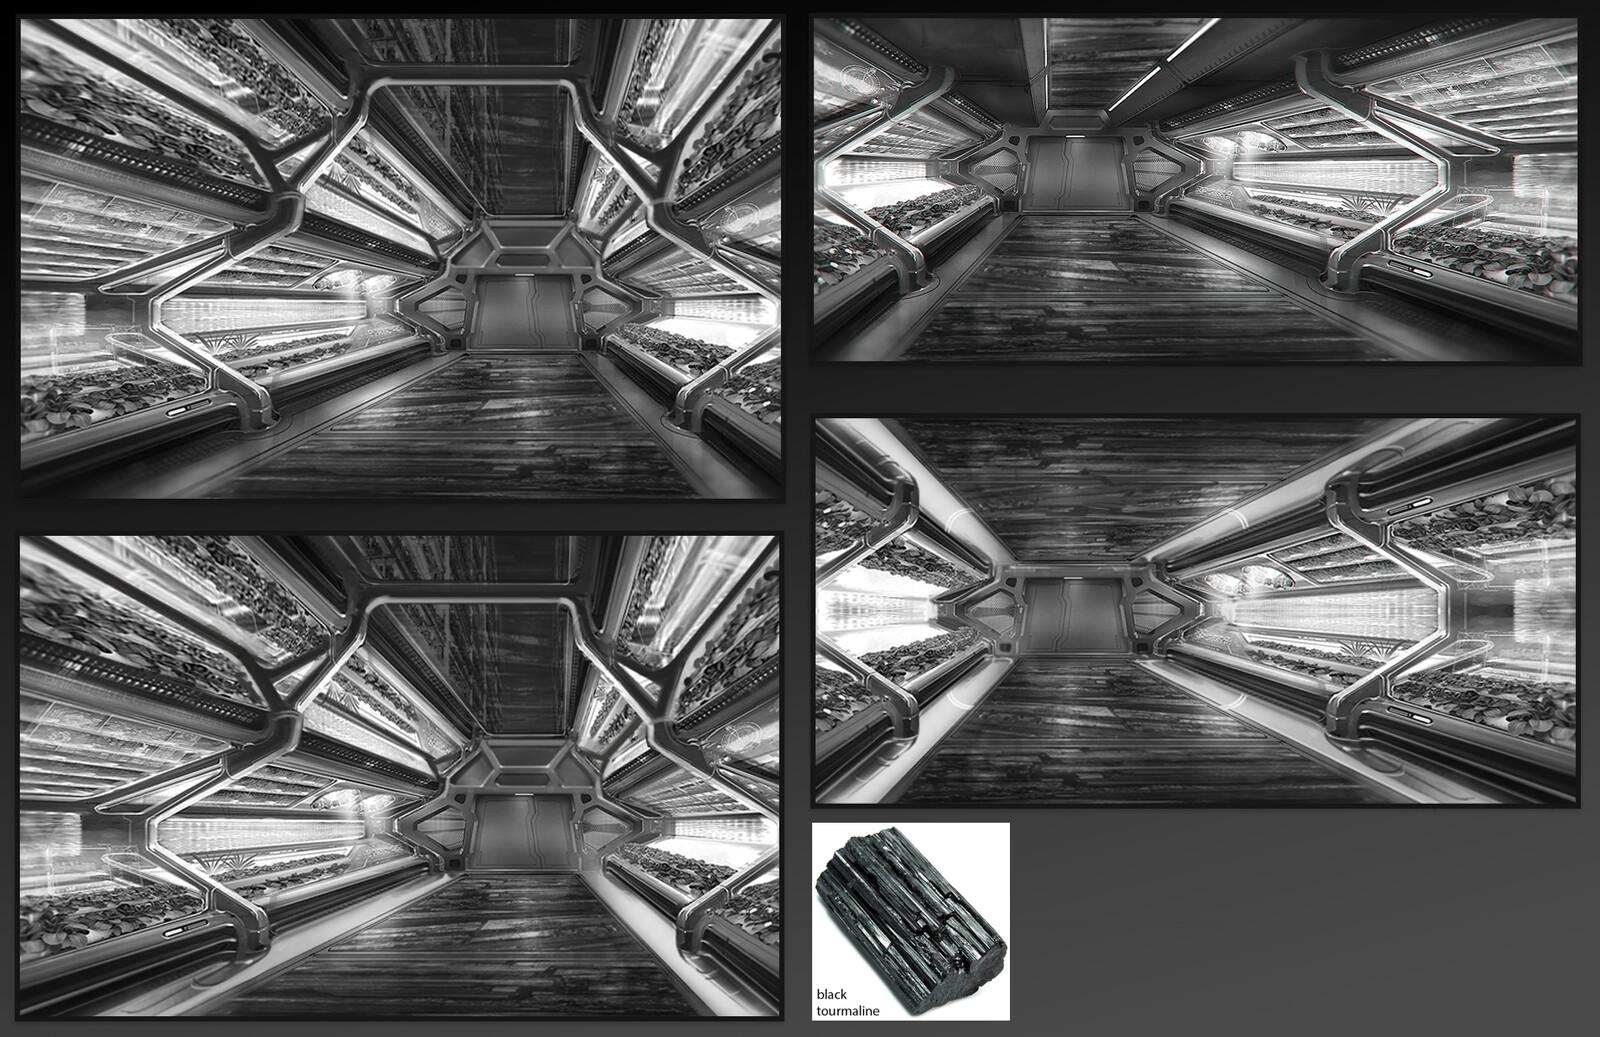 Lukari base - Hallways